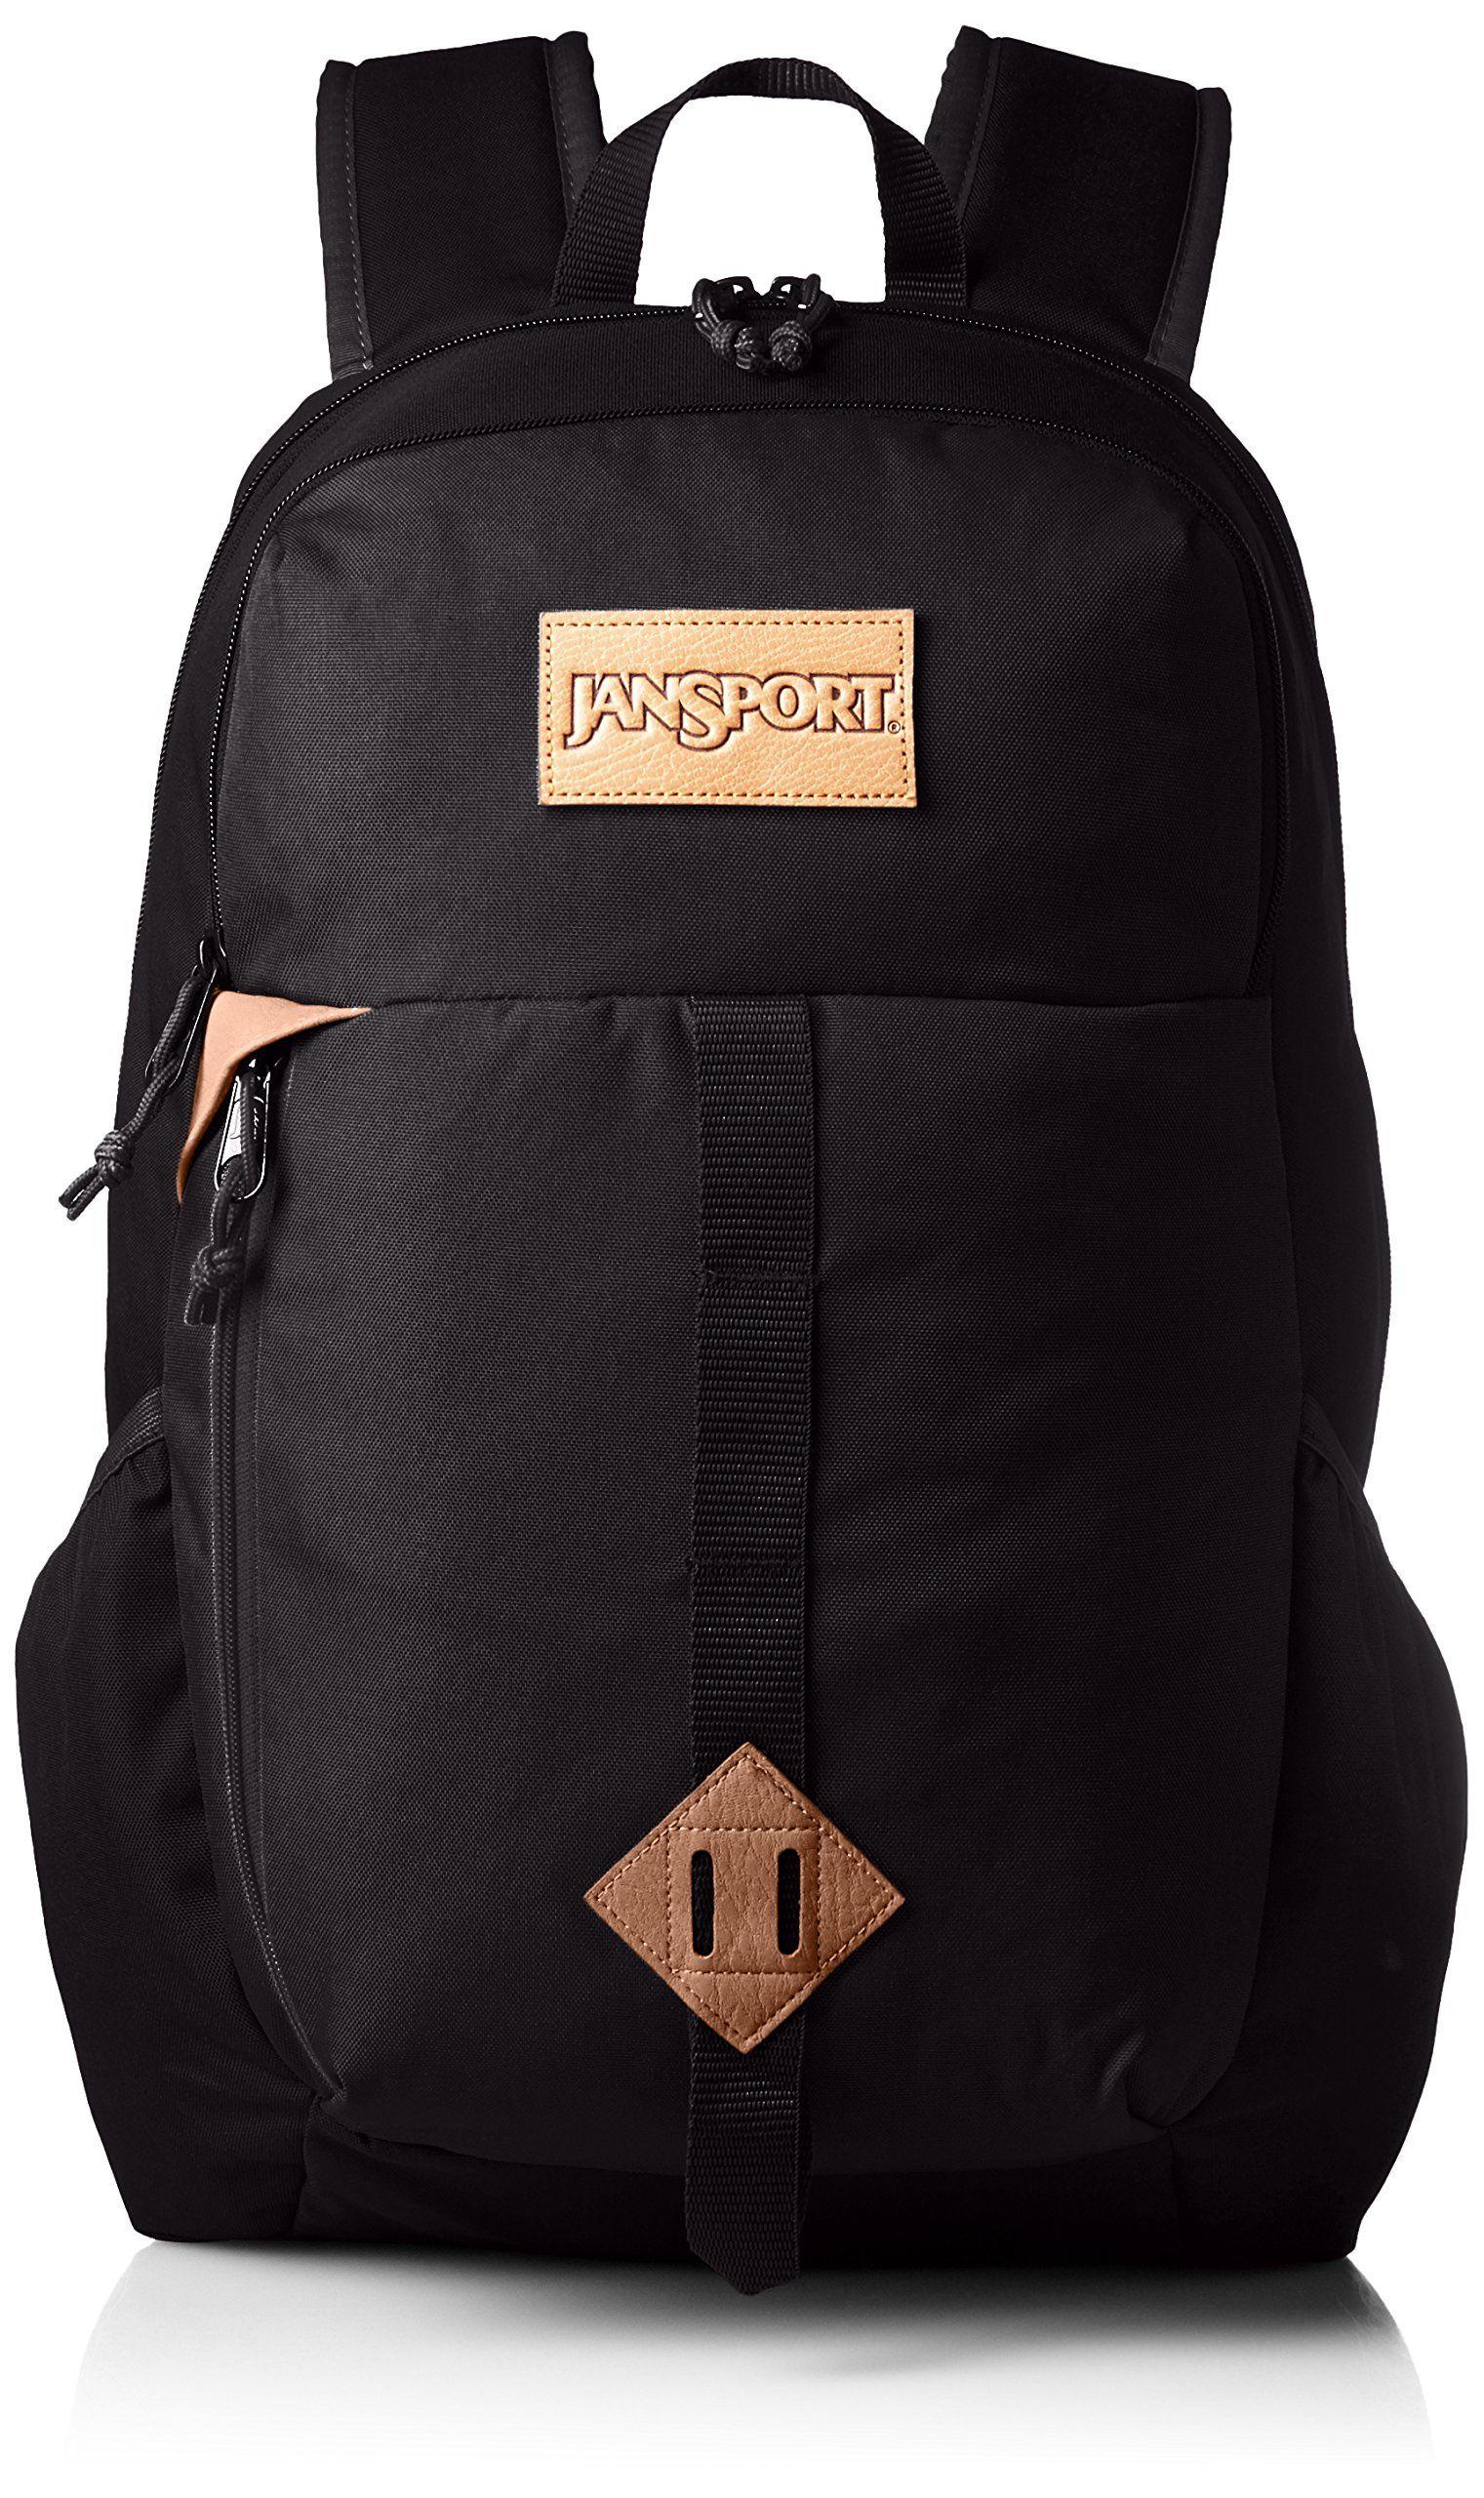 JanSport Hawk Ridge Laptop Backpack (Black)  d5439a48e